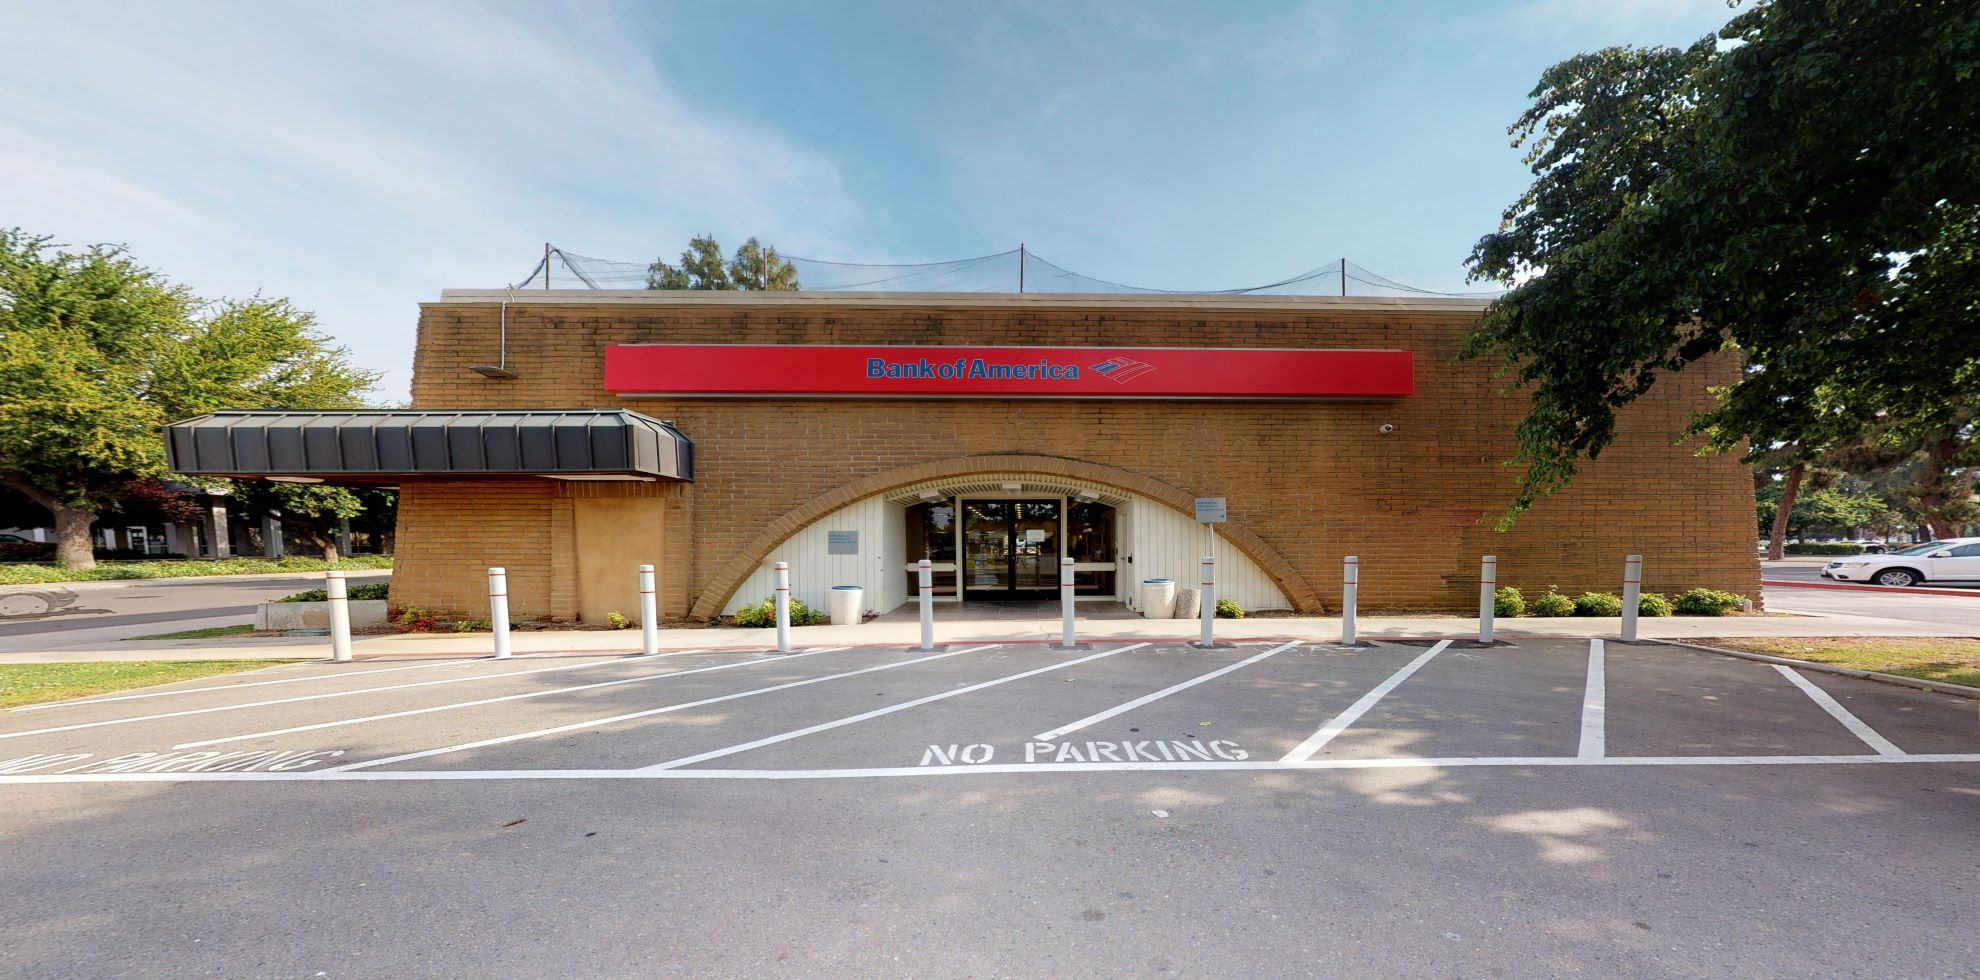 Bank of America financial center with drive-thru ATM | 590 E Shaw Ave, Fresno, CA 93710